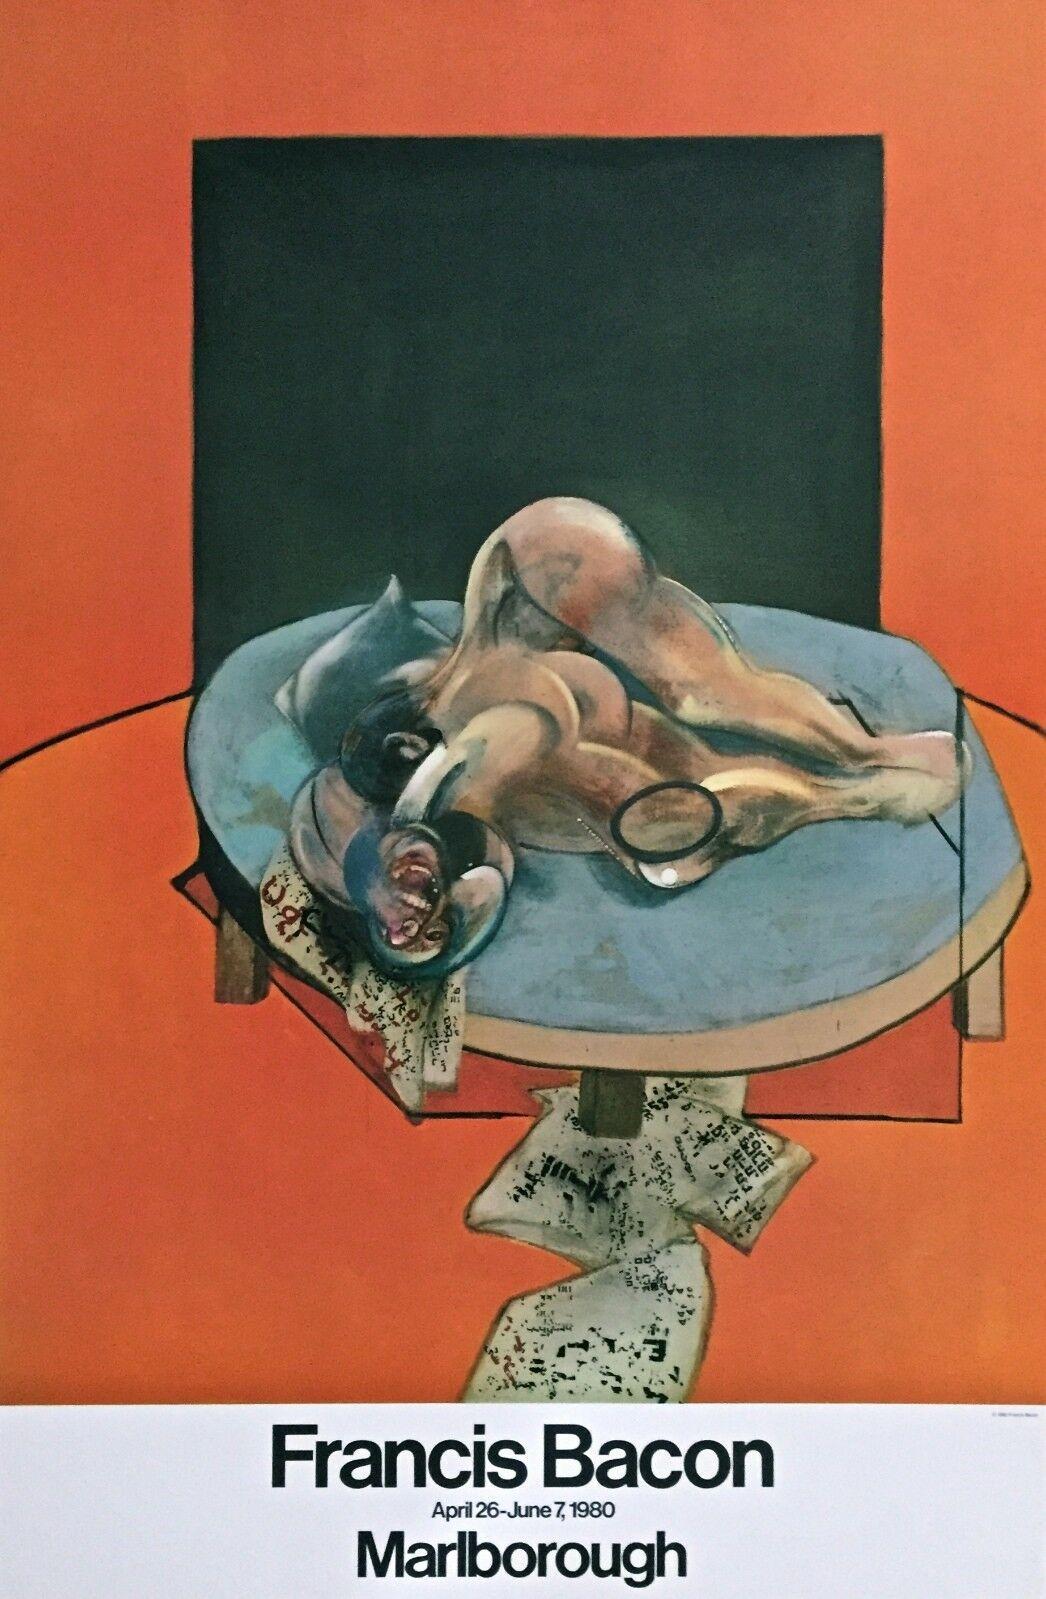 Untitled, 1980 Original Marlborough Gallery Exhibition Offset Lithograph